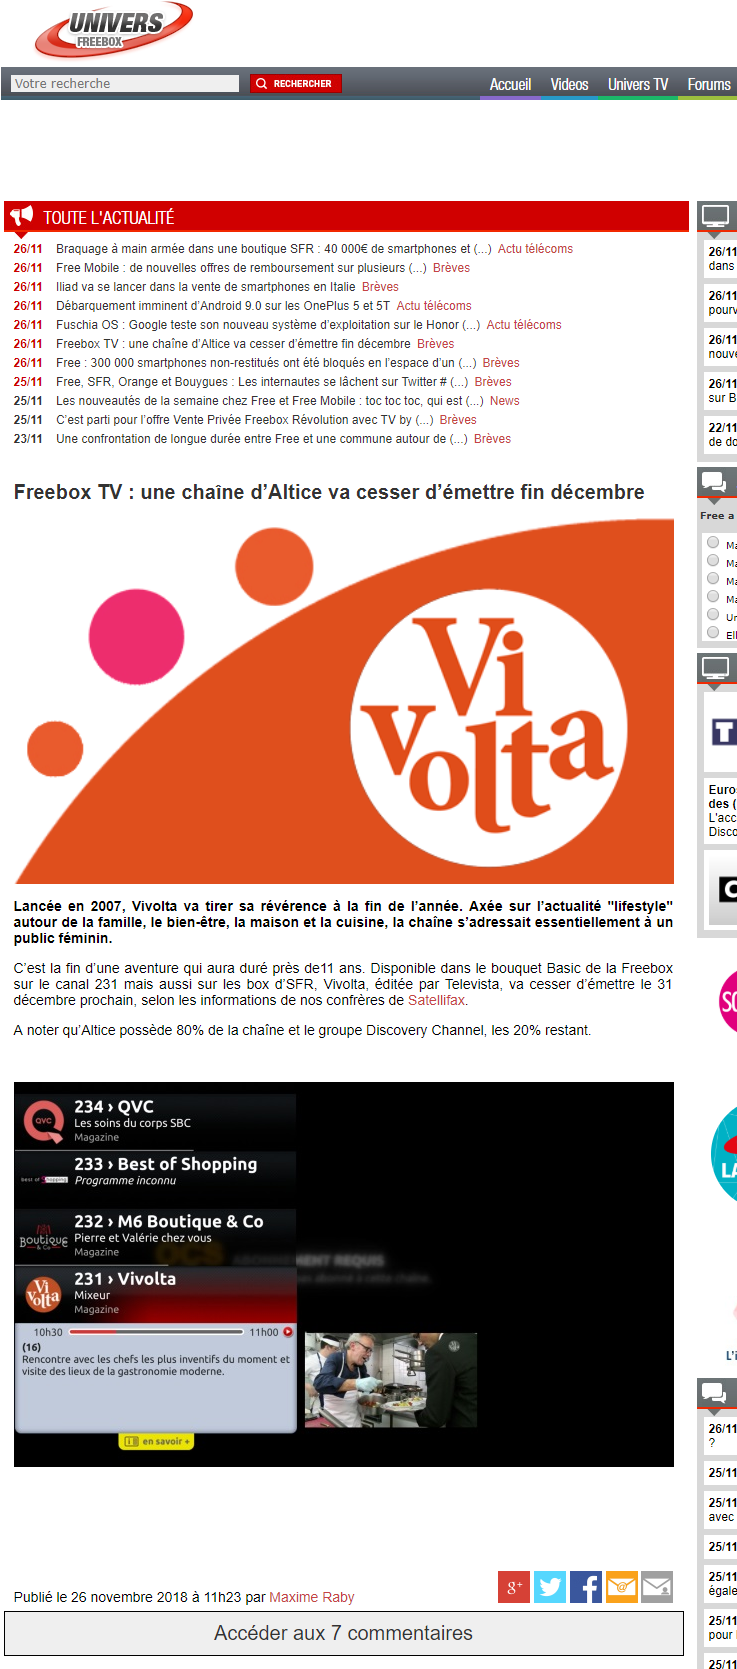 screencapture-universfreebox-article-47364-Freebox-TV-une-chaine-d-Altice-va-cesser-d-emettre-fin-decembre-2018-11-26-15_30_57